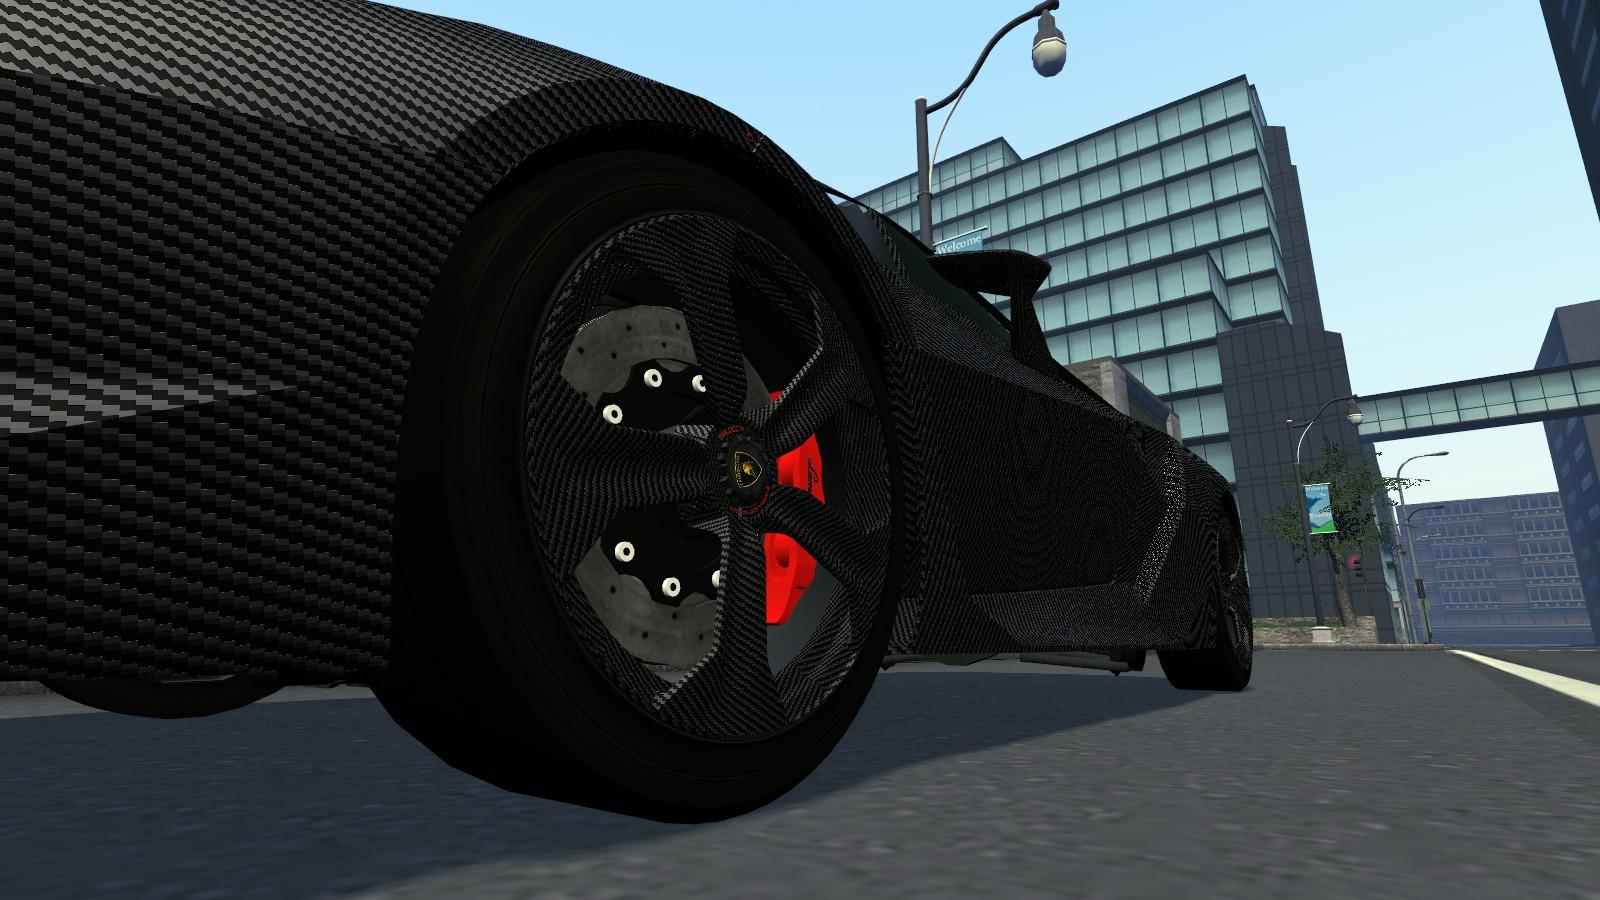 Steam Workshop :: 2011 Lamborghini Sesto Elemento (New) on chevrolet camaro rims, lamborghini aventador rims, audi s5 rims, lexus lfa rims, aston martin rims, lamborghini gallardo spyder rims, maserati granturismo rims, mustang rims, porsche 918 rims, bmw m3 rims, porsche cayman rims, lamborghini countach rims,